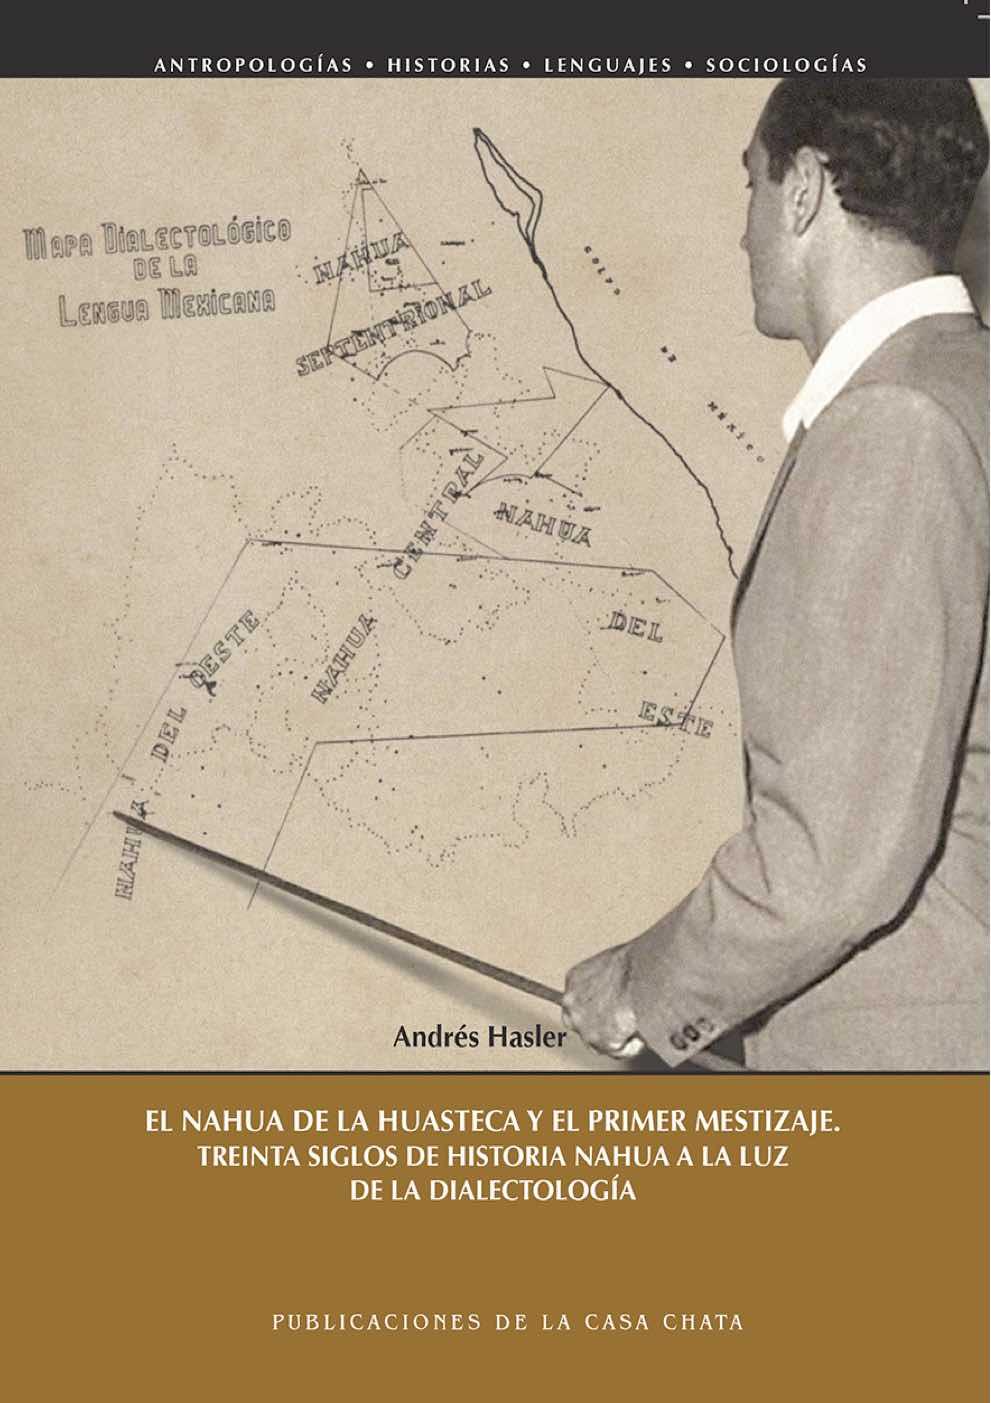 https://www.librosciesas.com/wp-content/uploads/2016/05/NahuaHuasteca.jpg